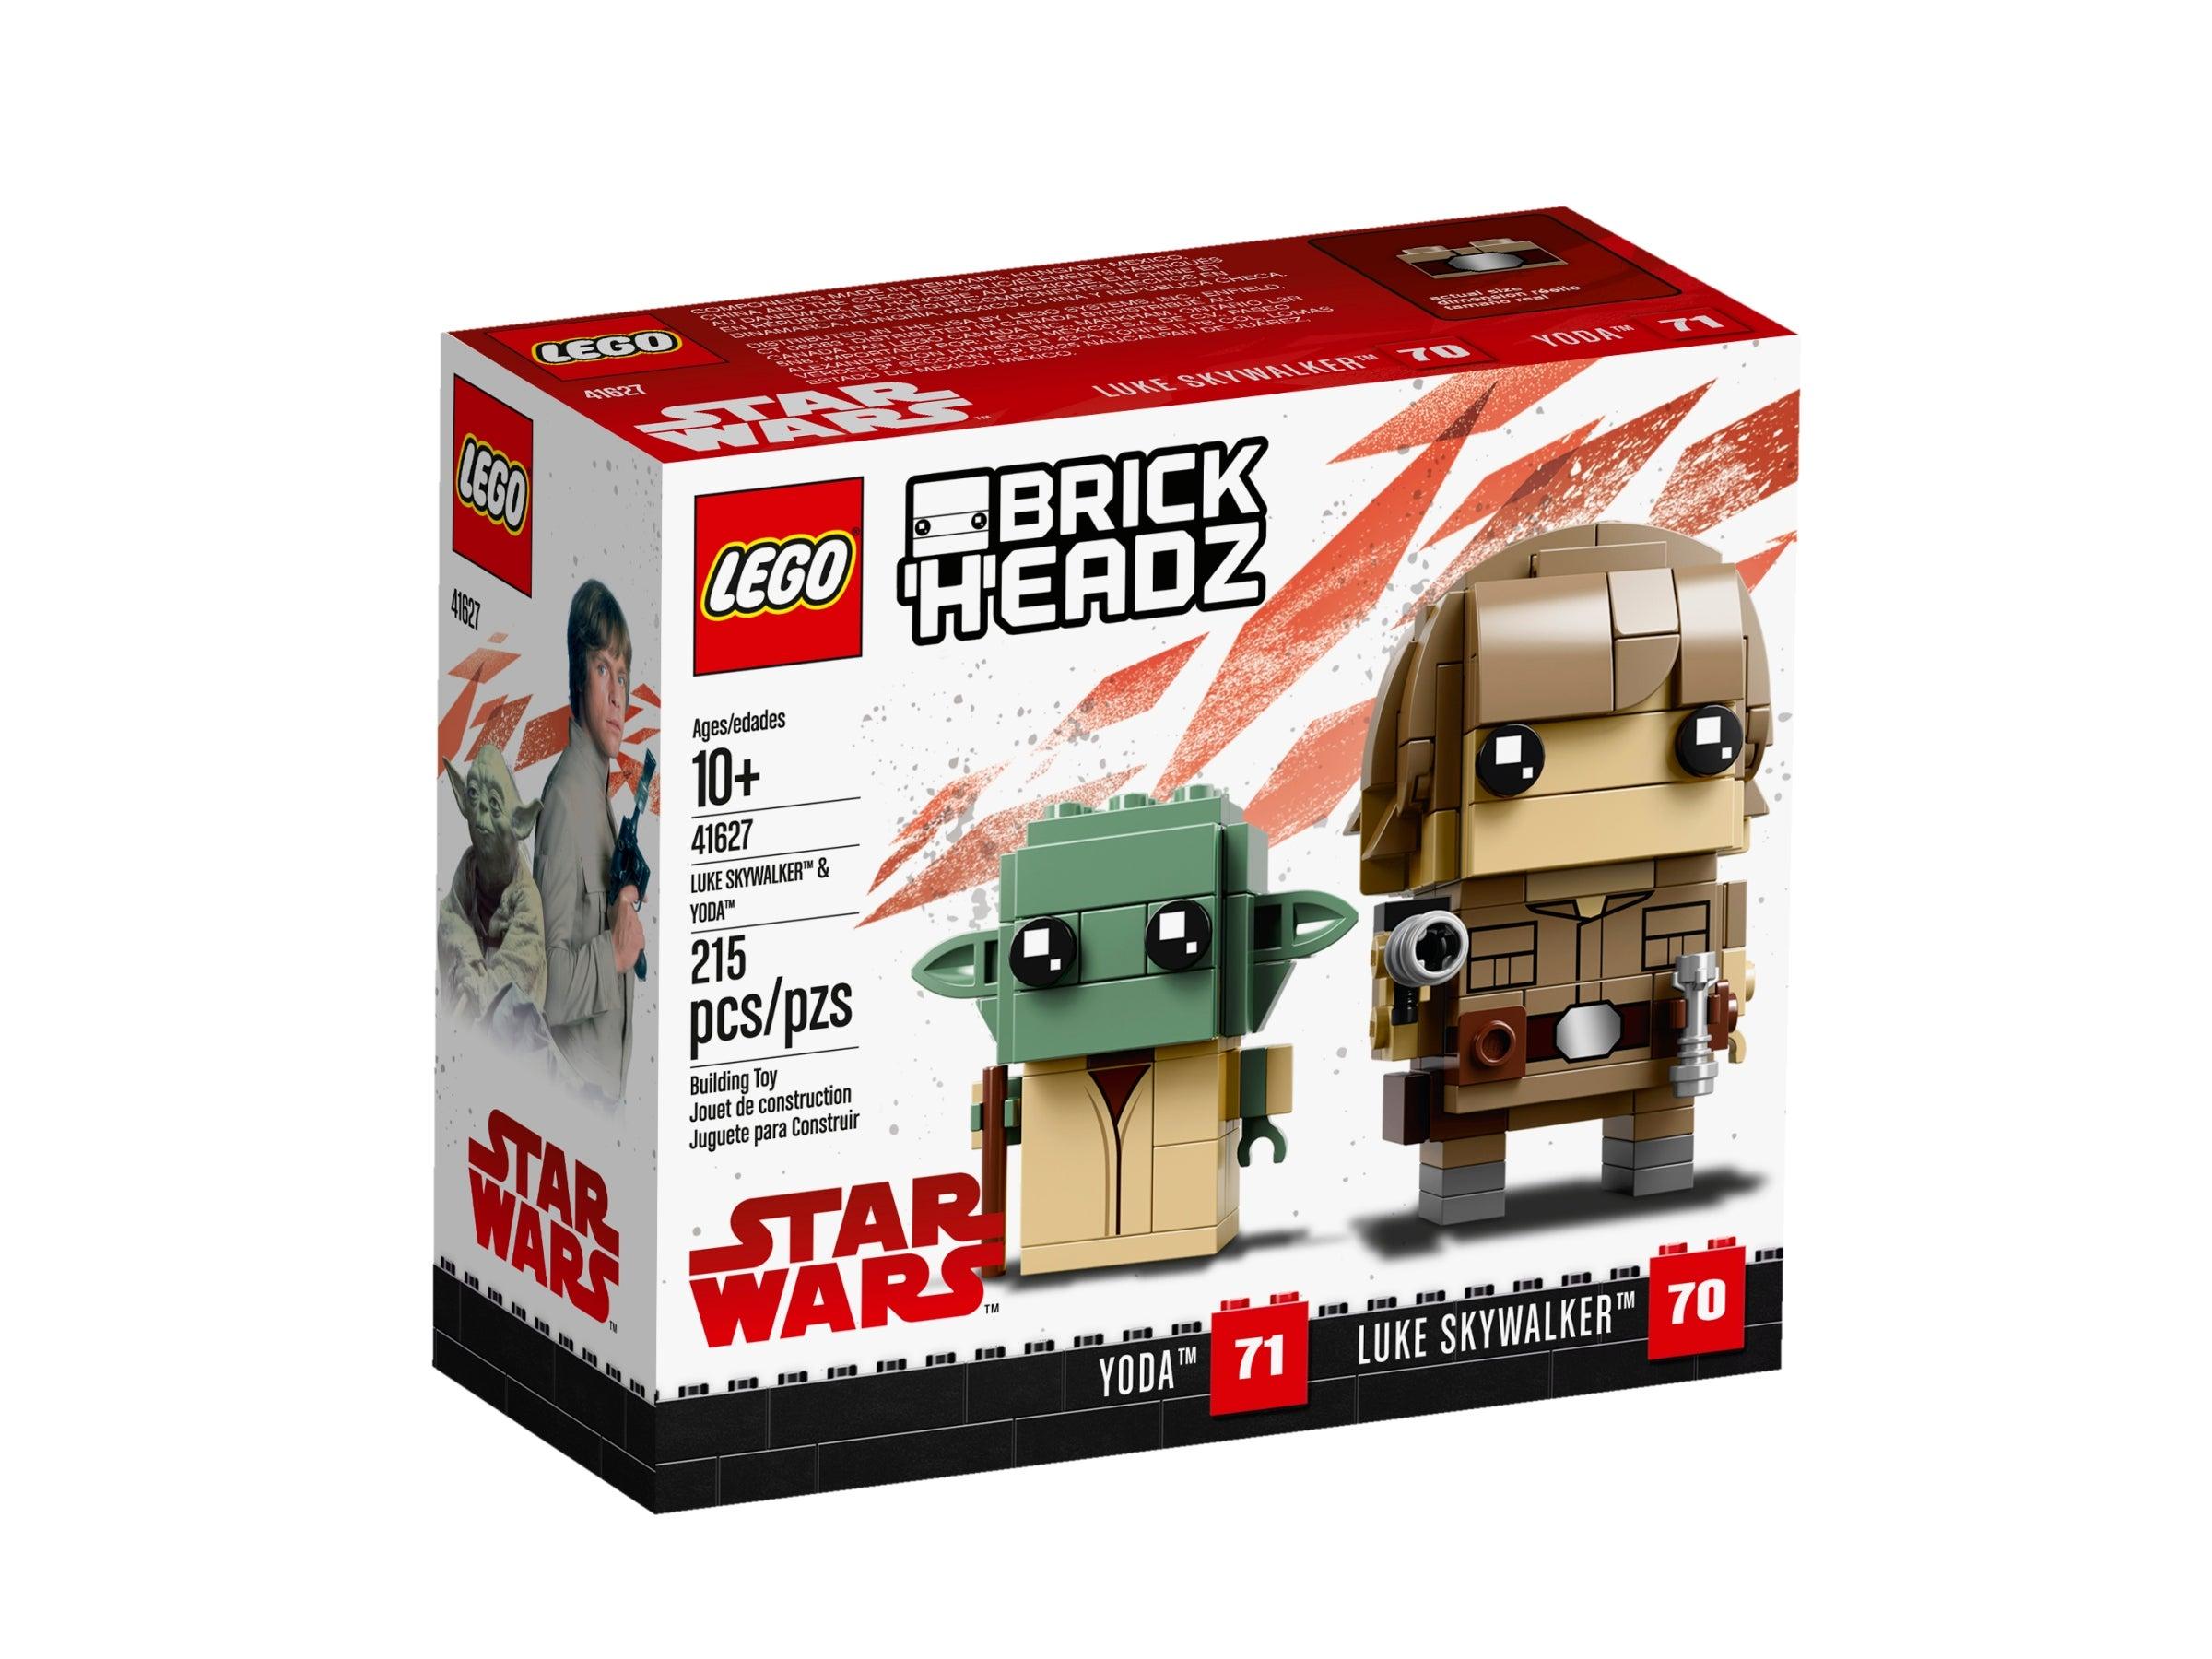 LEGO 41627 BrickHeadz Luke Skywalker /& Yoda Star Wars 71 70